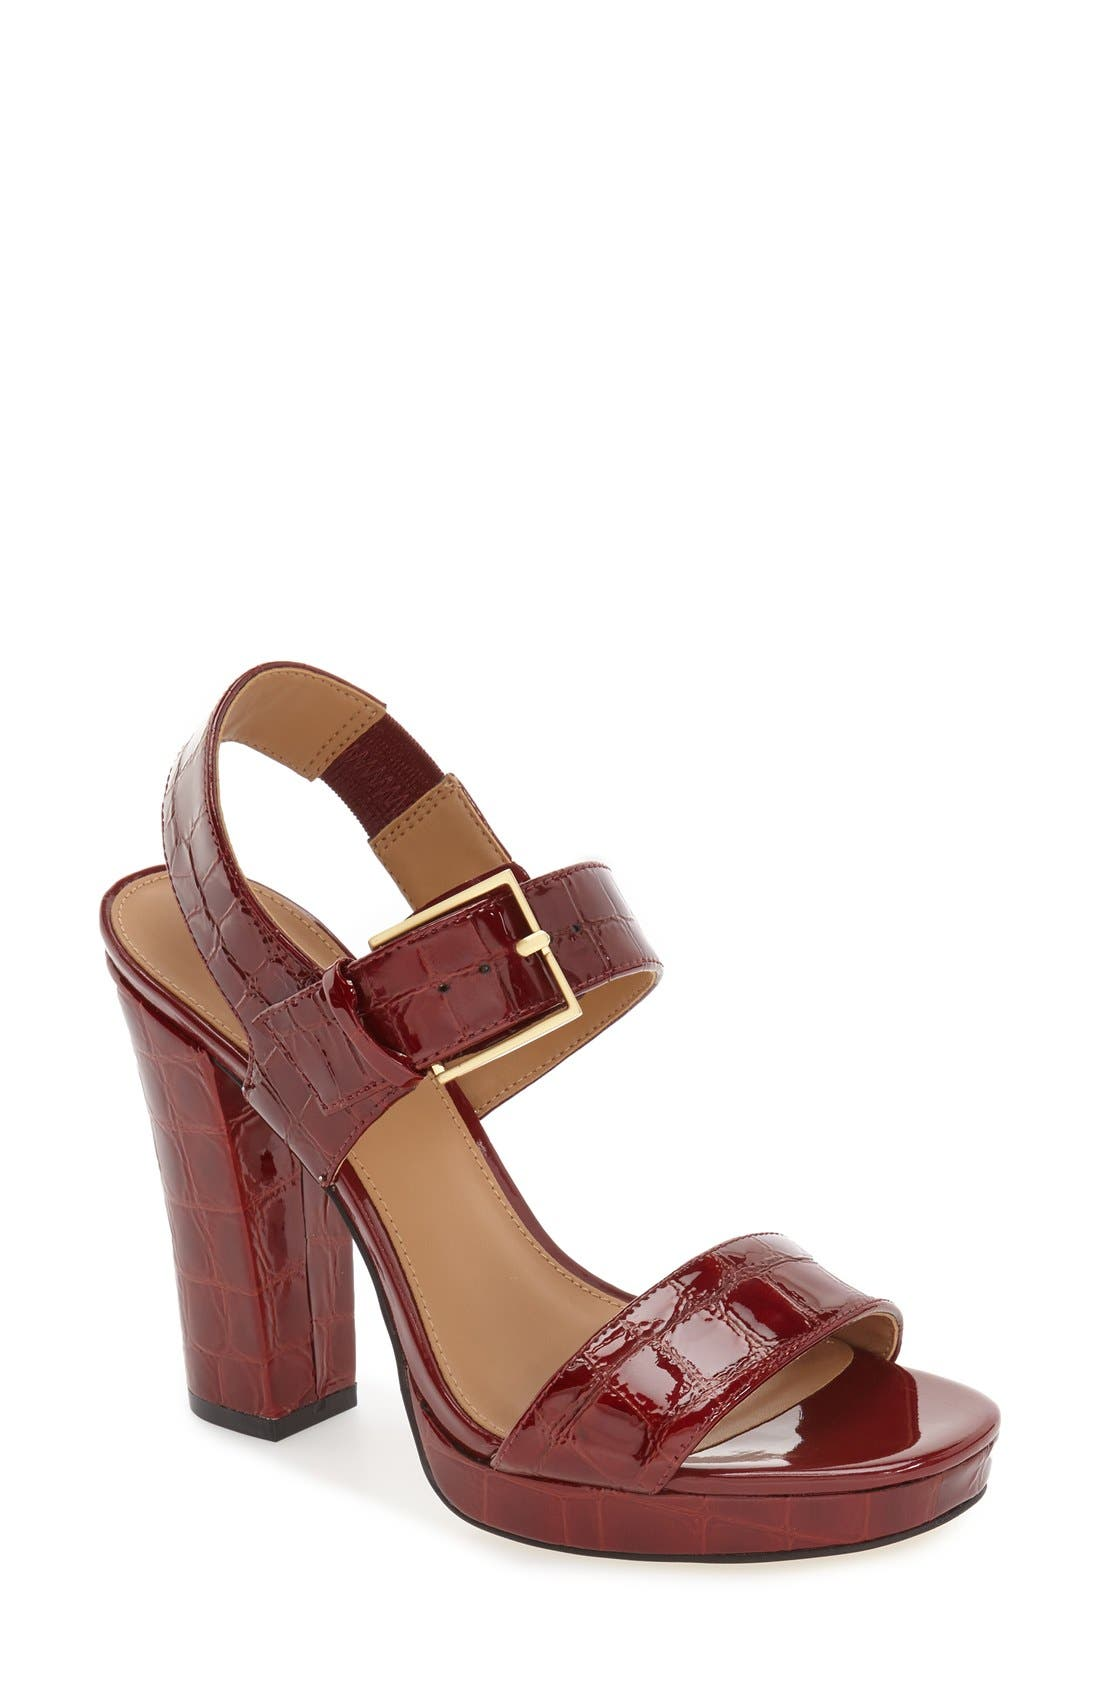 CALVIN KLEIN 'Bette' Block Heel Sandal